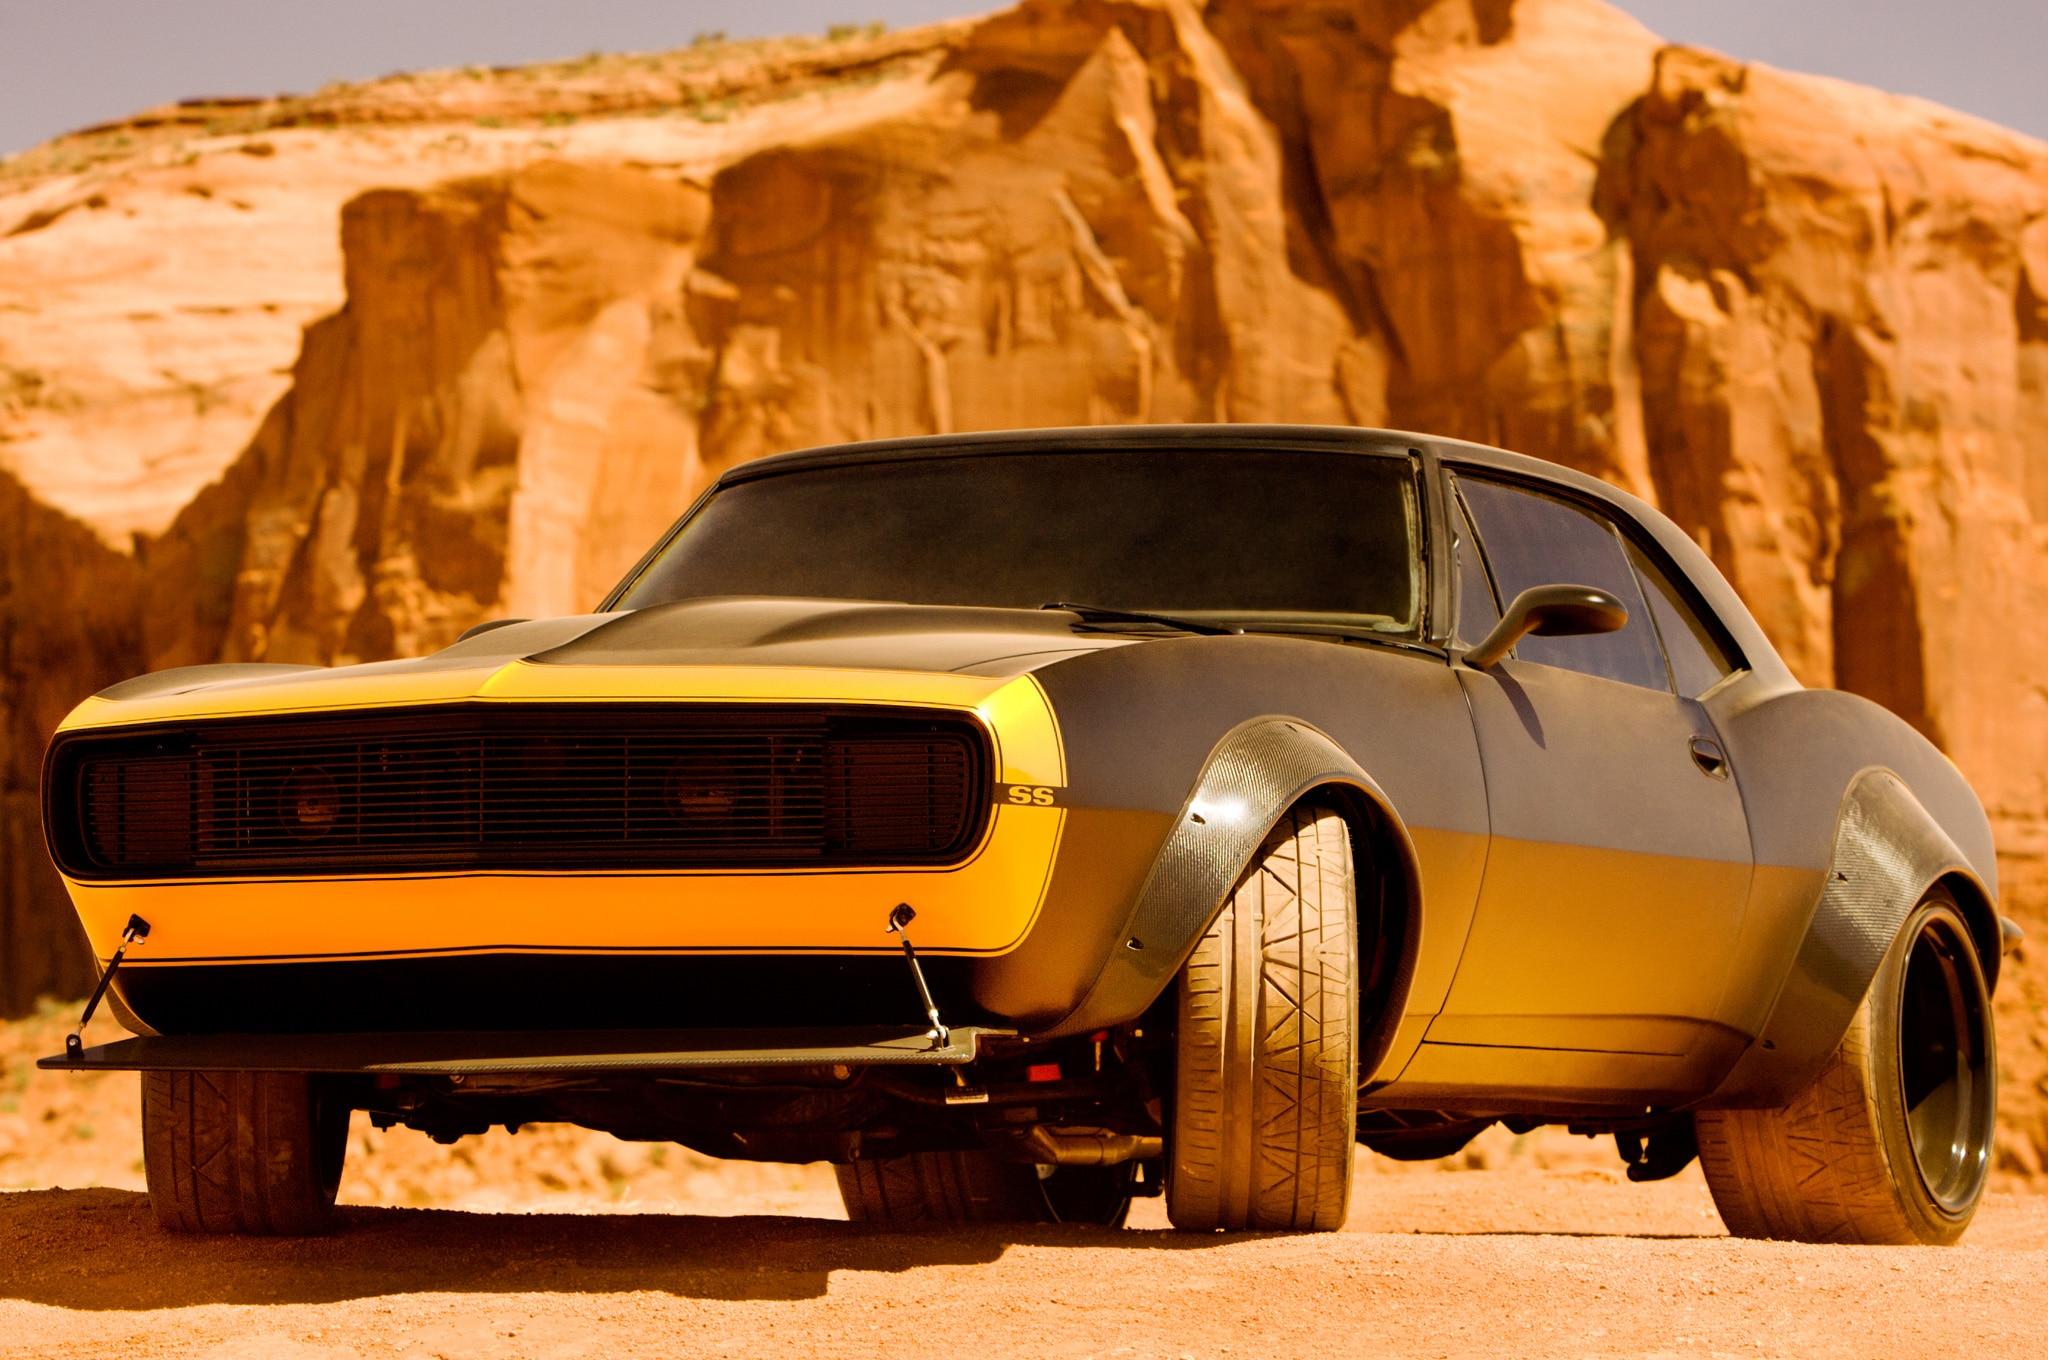 Transformers 4 Bumblebee 1967 Chevrolet Camaro1